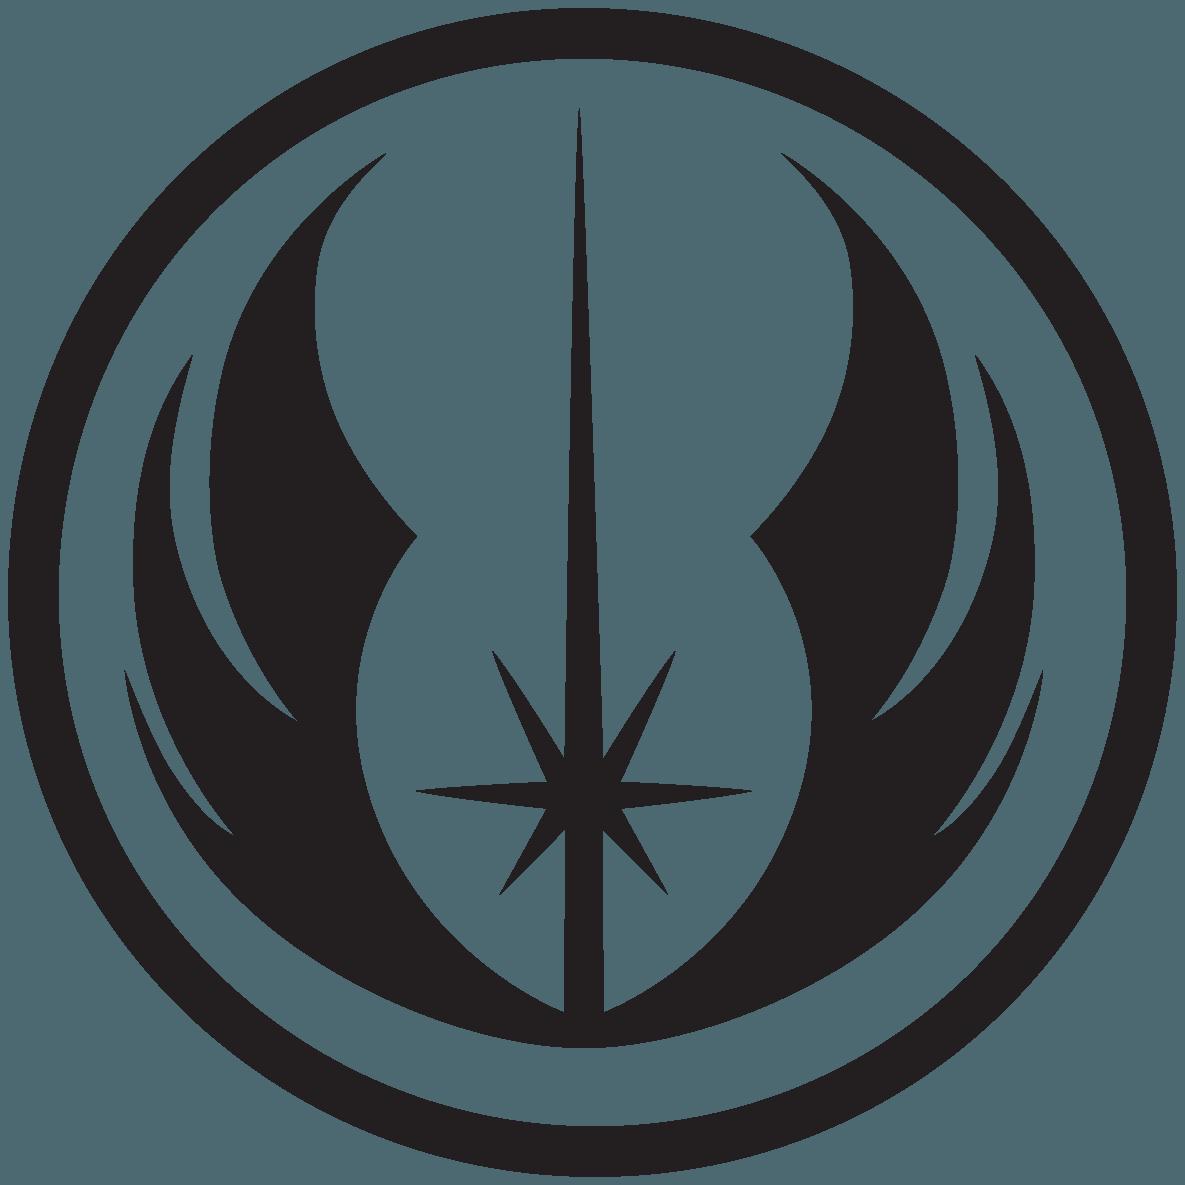 Star Wars Symbole